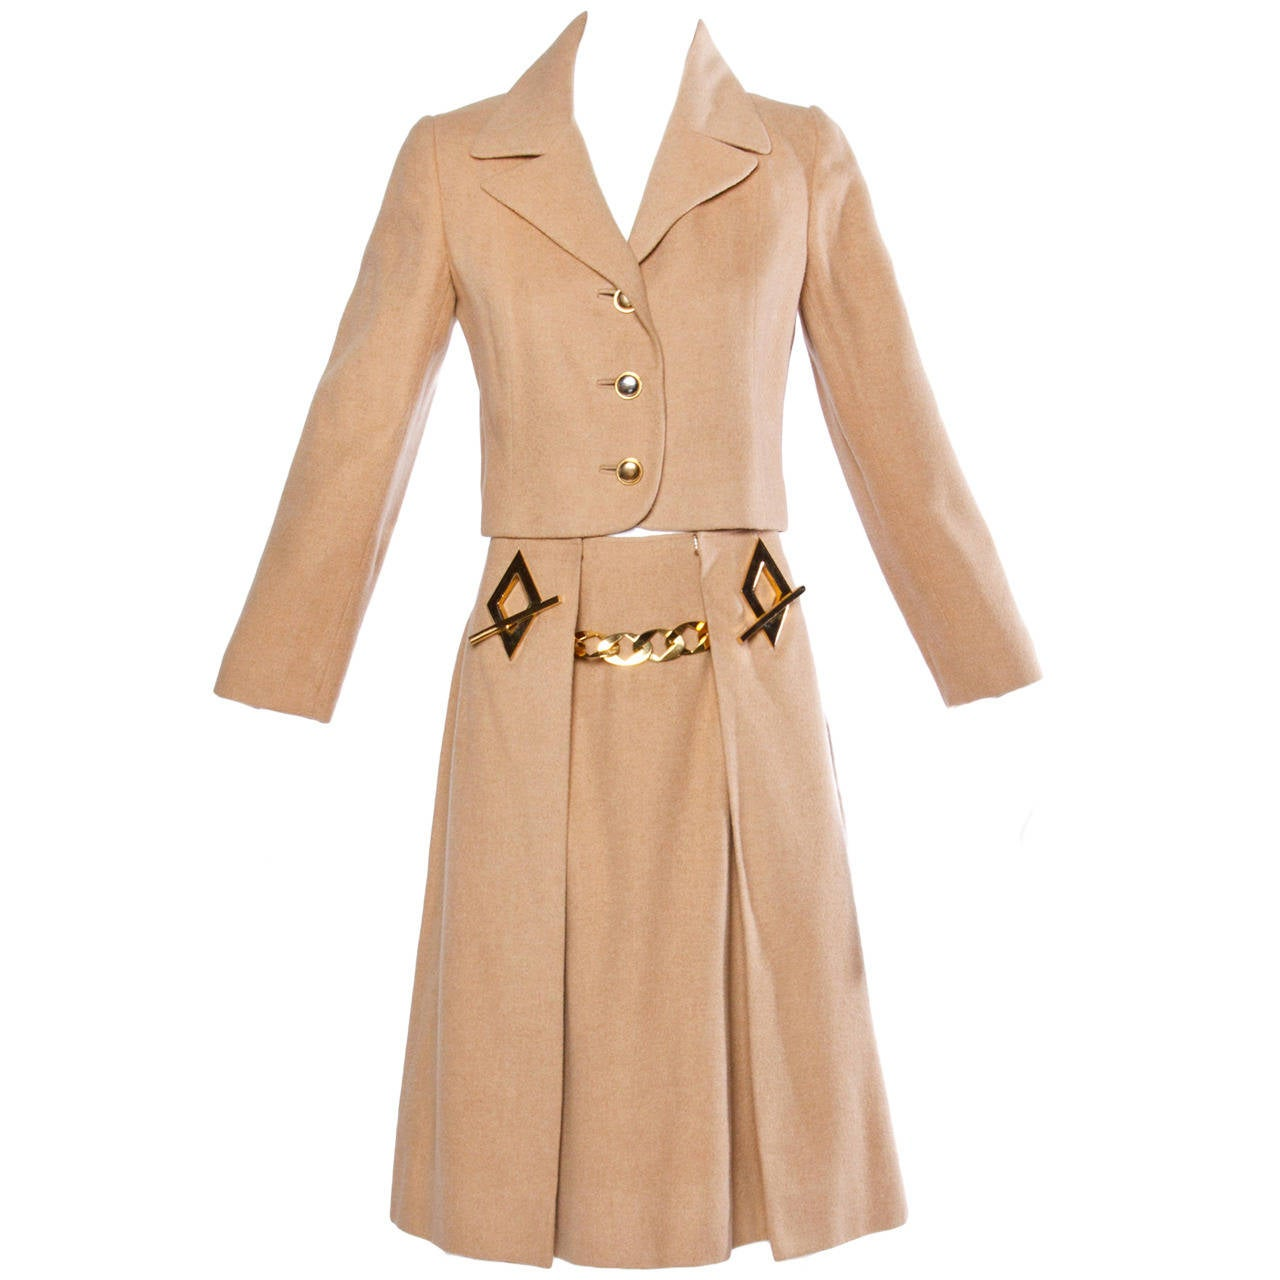 Frances Heffernan Vintage 1970s Camel Hair Jacket + Skirt ...